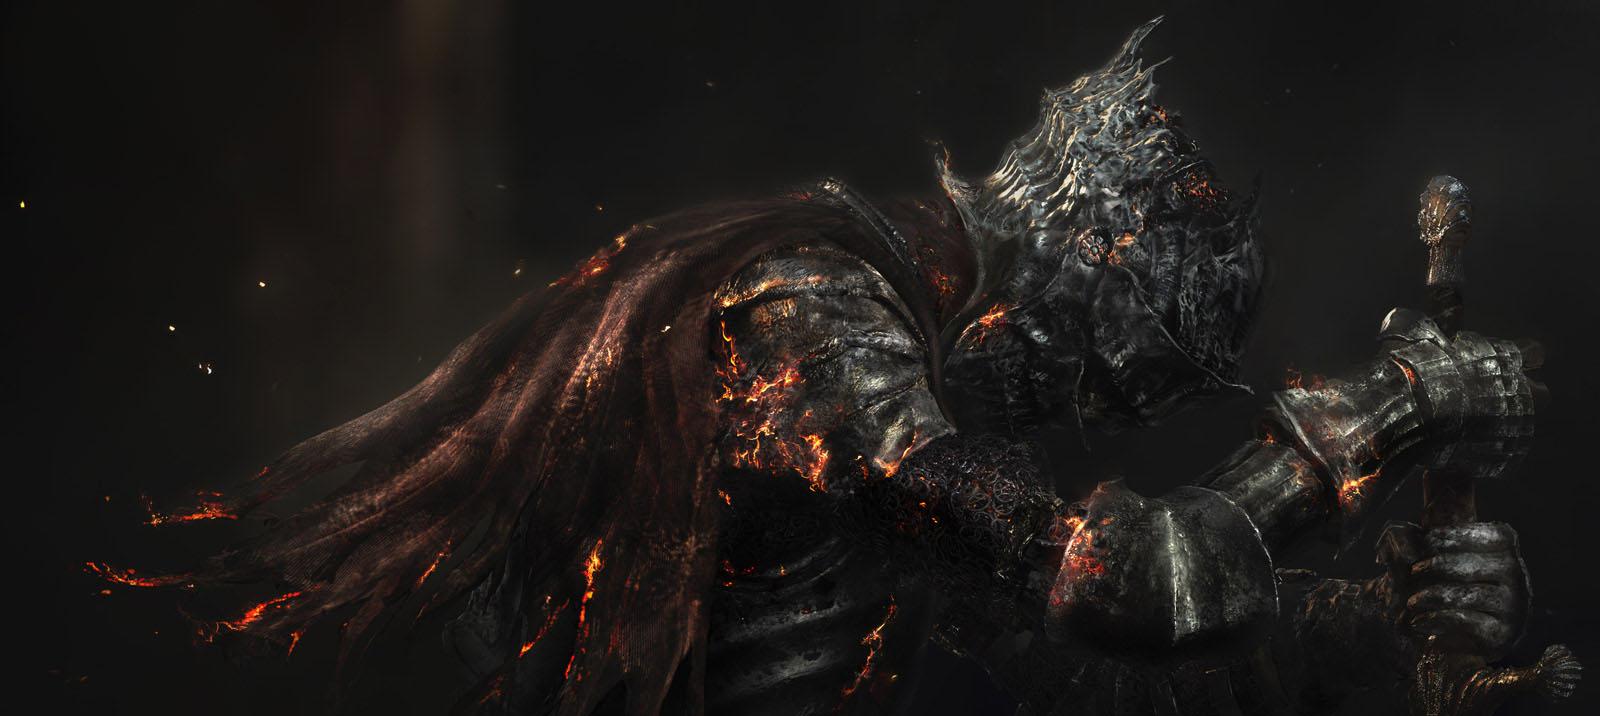 http://www.gamer.ru/system/attached_images/images/000/713/595/original/288974353.jpg